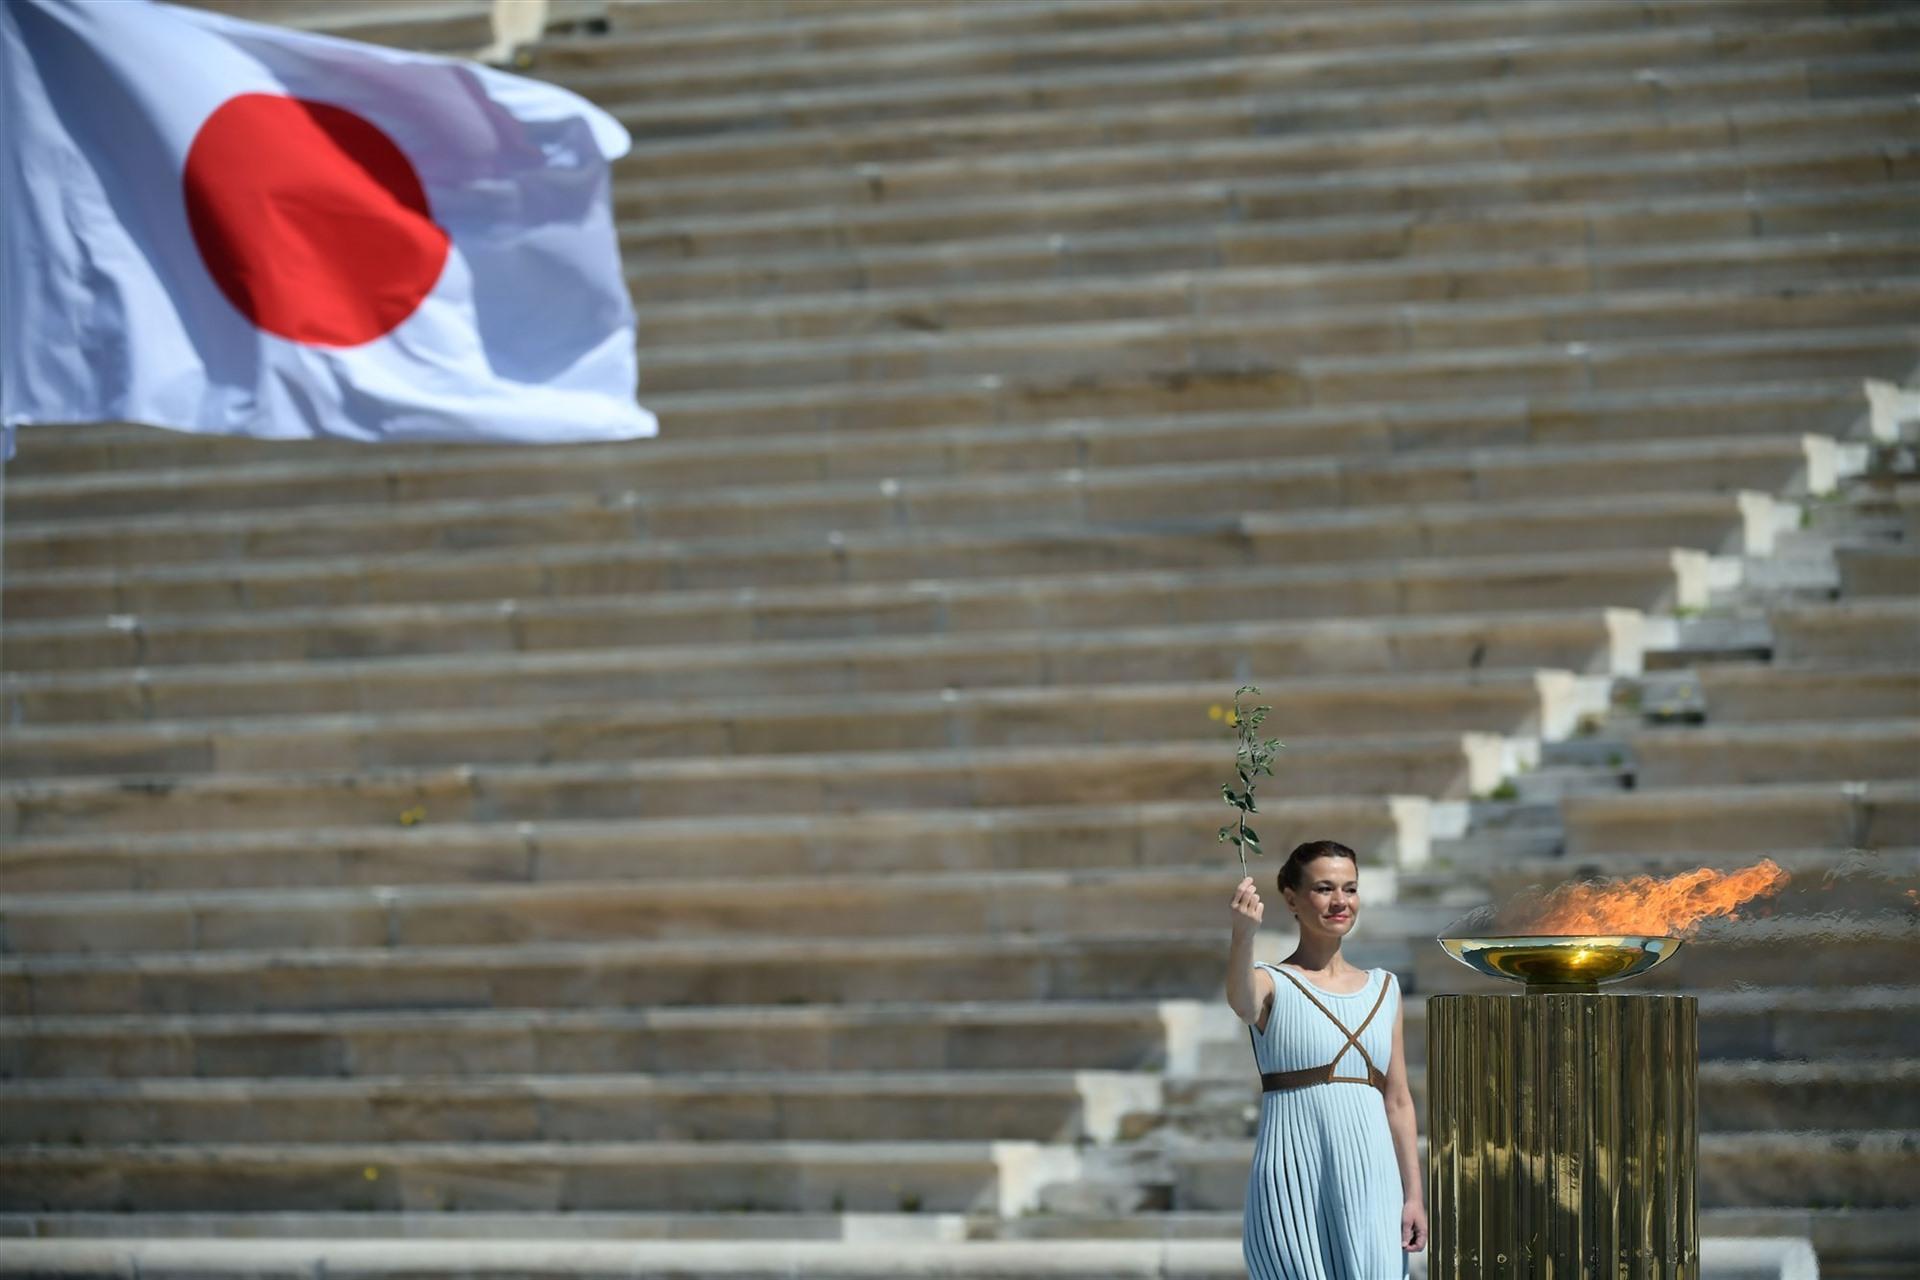 Canada, Australia khong tham du Olympic Tokyo 2020 vi lo ngai dich COVID-19